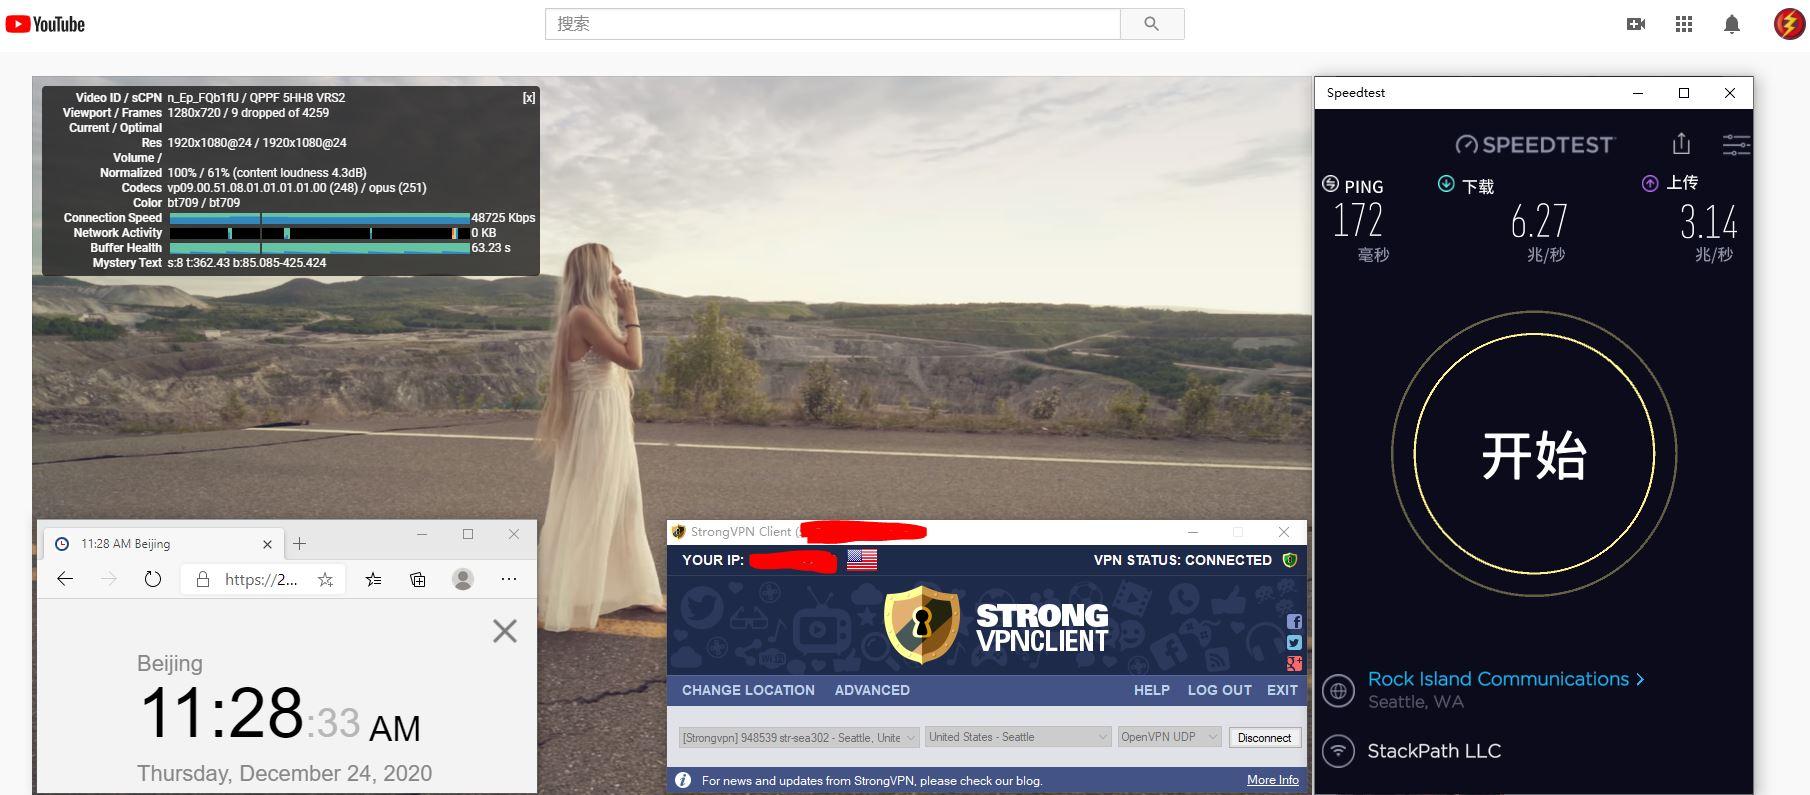 Windows10 StrongVPN USA - Seattle-2 服务器 中国VPN 翻墙 科学上网 测试 - 20201224